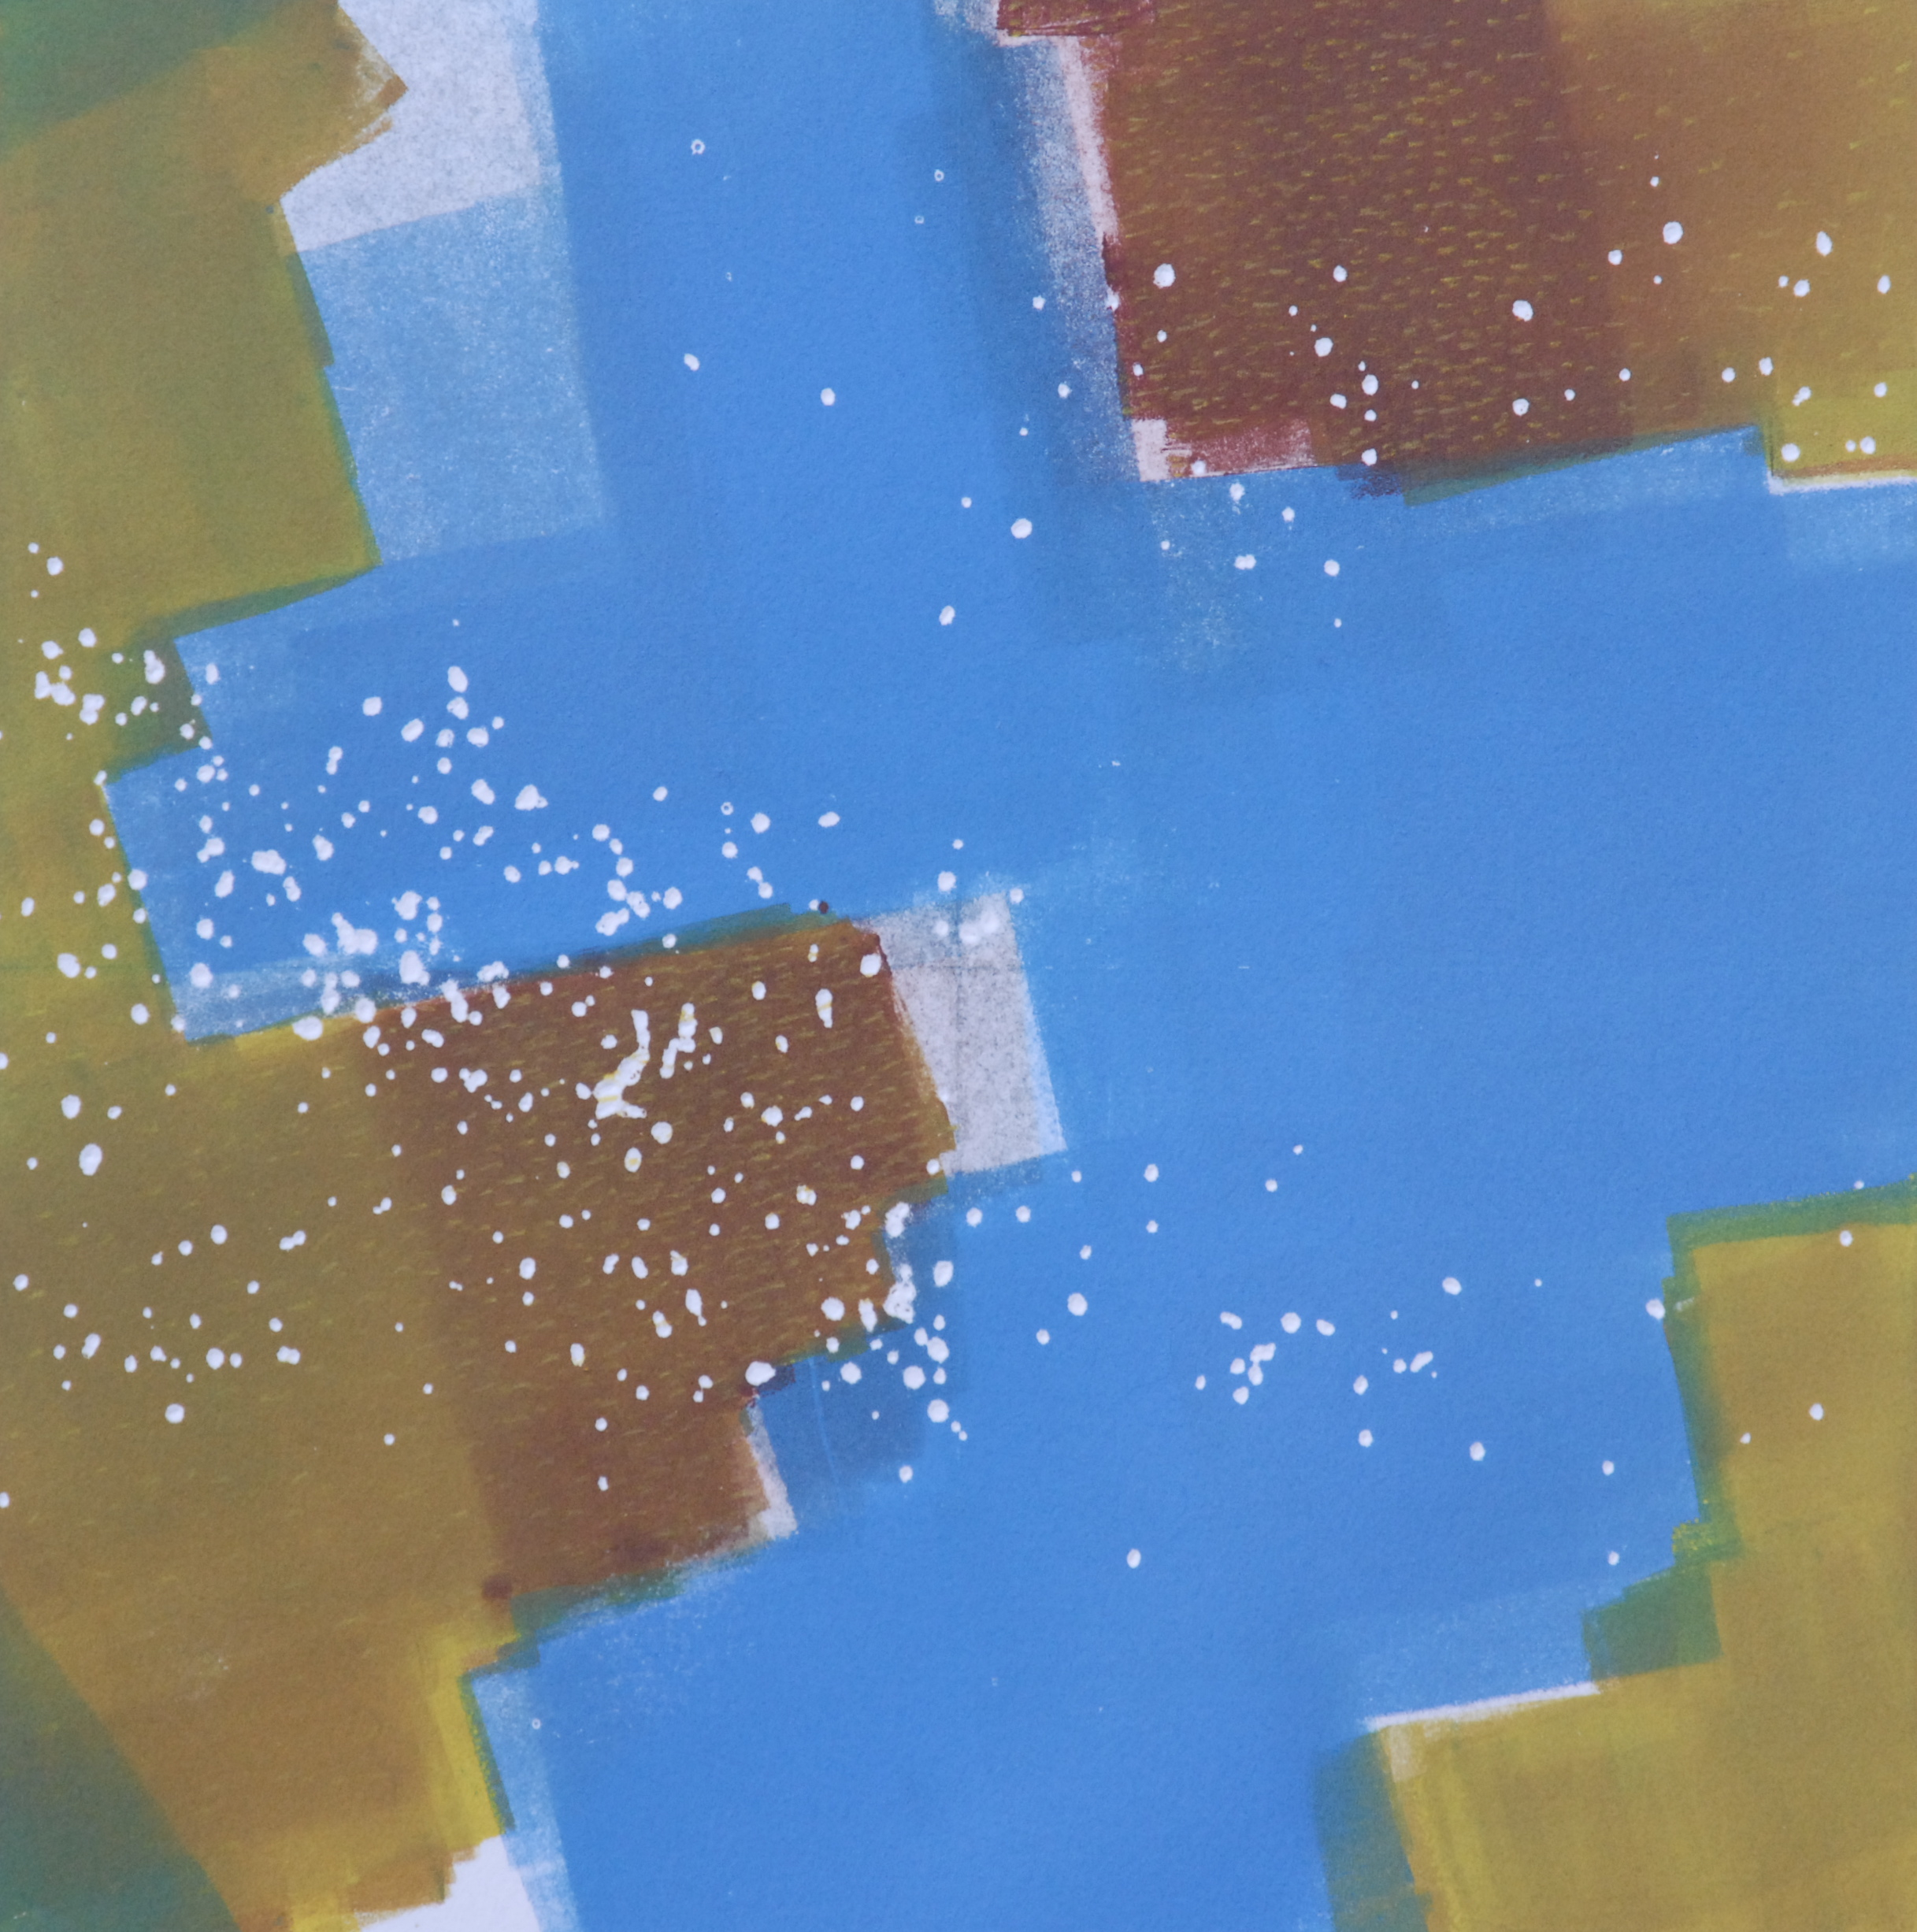 "Sodium Deviation 33, 2016  monoprint  10"" x 10"" image on 11"" x 14"" paper"